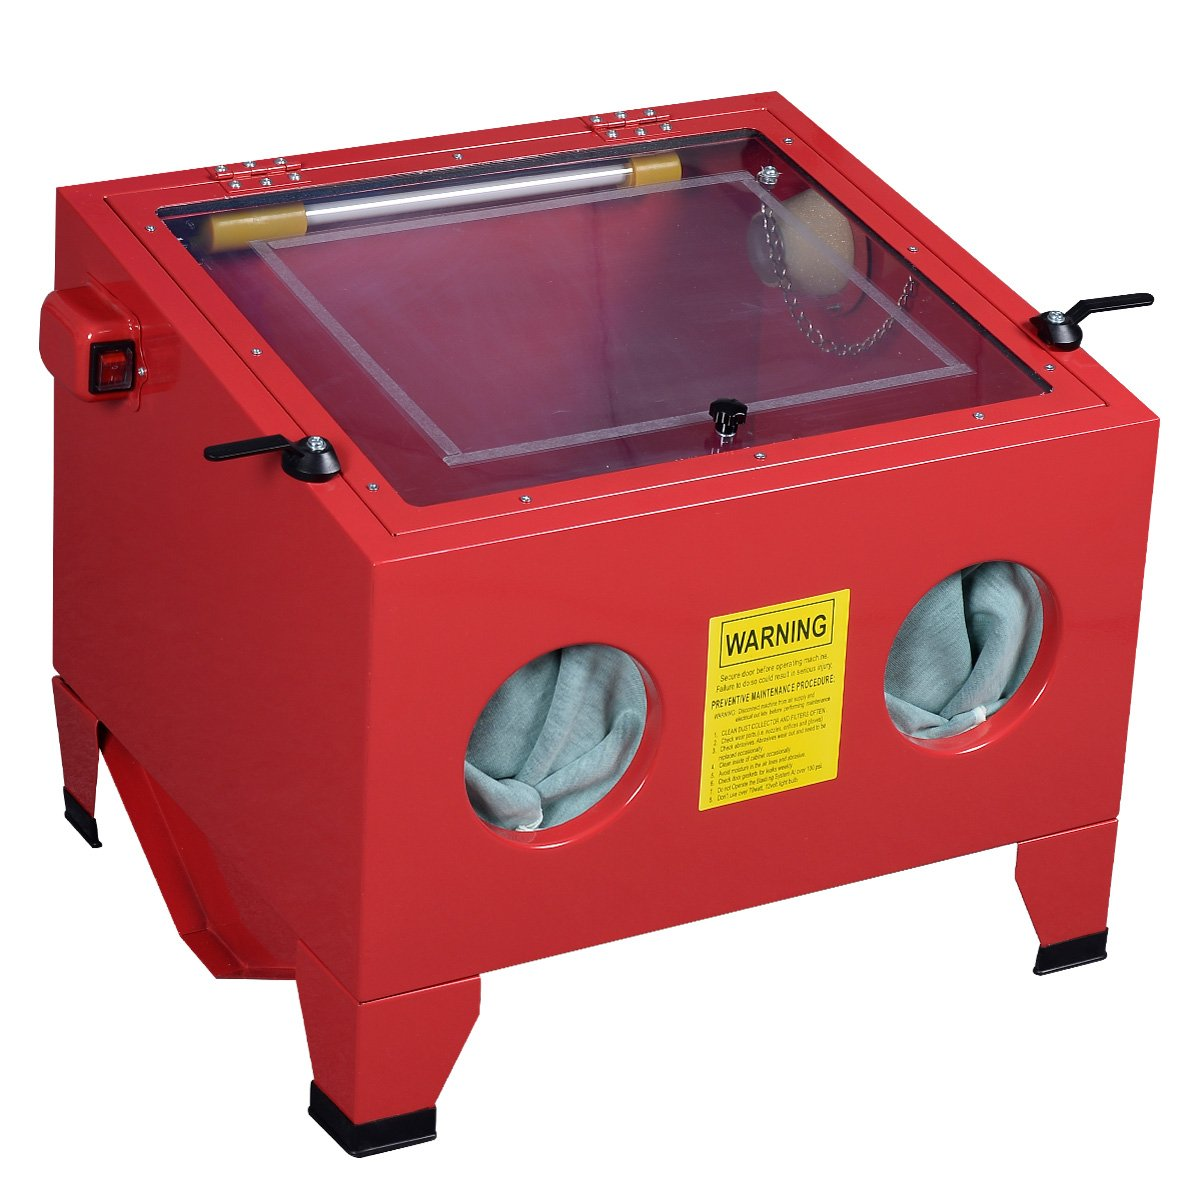 25 Gallon Bench Top Sandblast Cabinet Air Sand Blaster Sand Blast